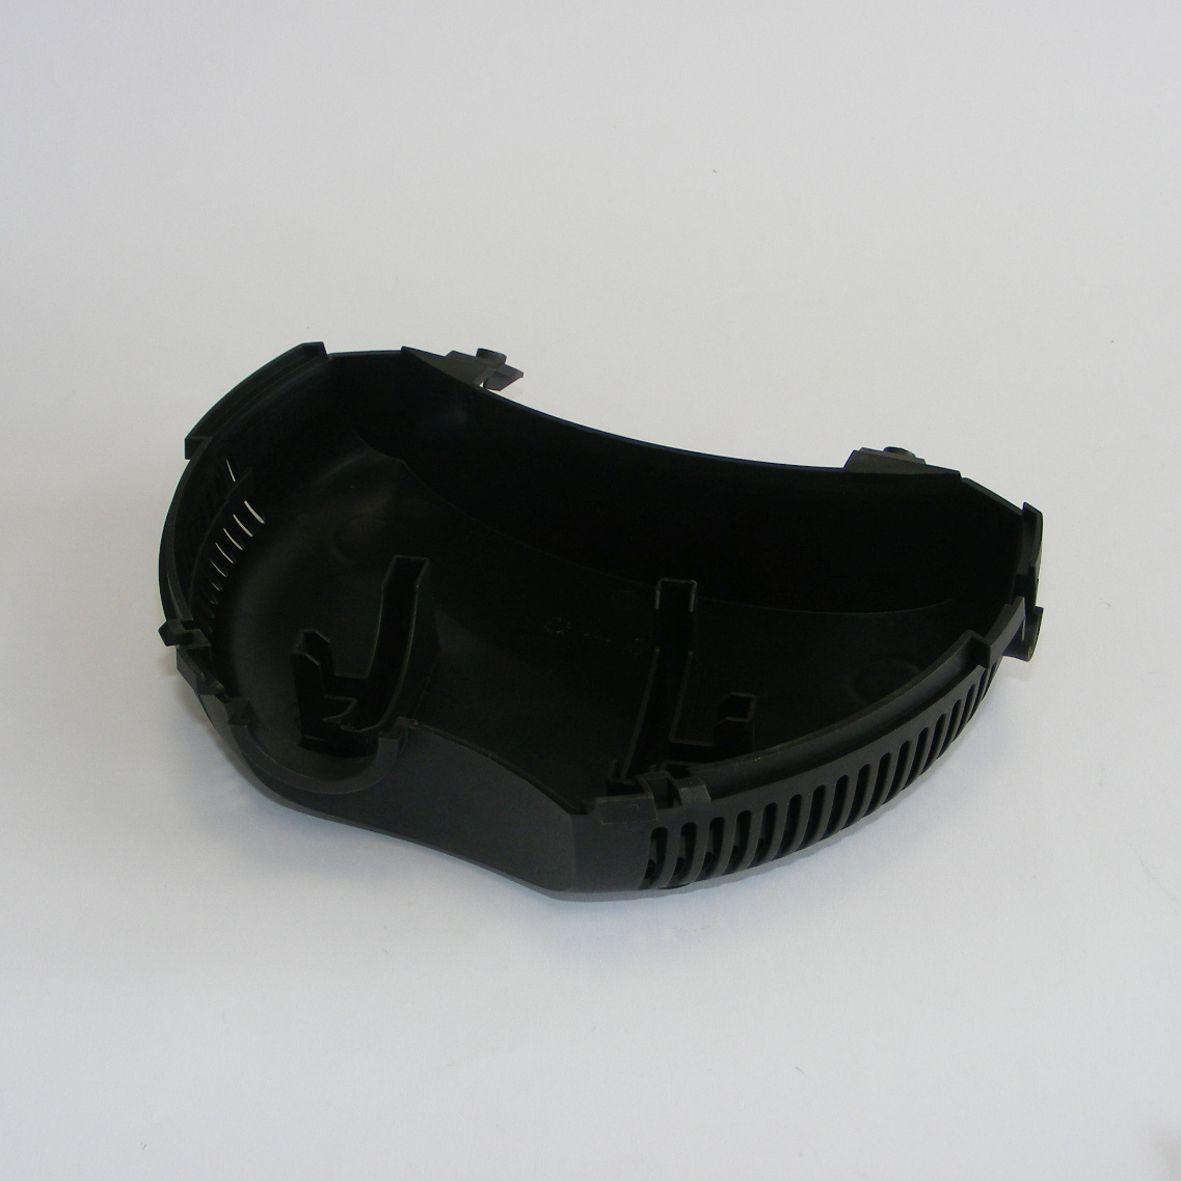 oase filtergeh use unterteil aquamax 2000 teichundgarten24. Black Bedroom Furniture Sets. Home Design Ideas